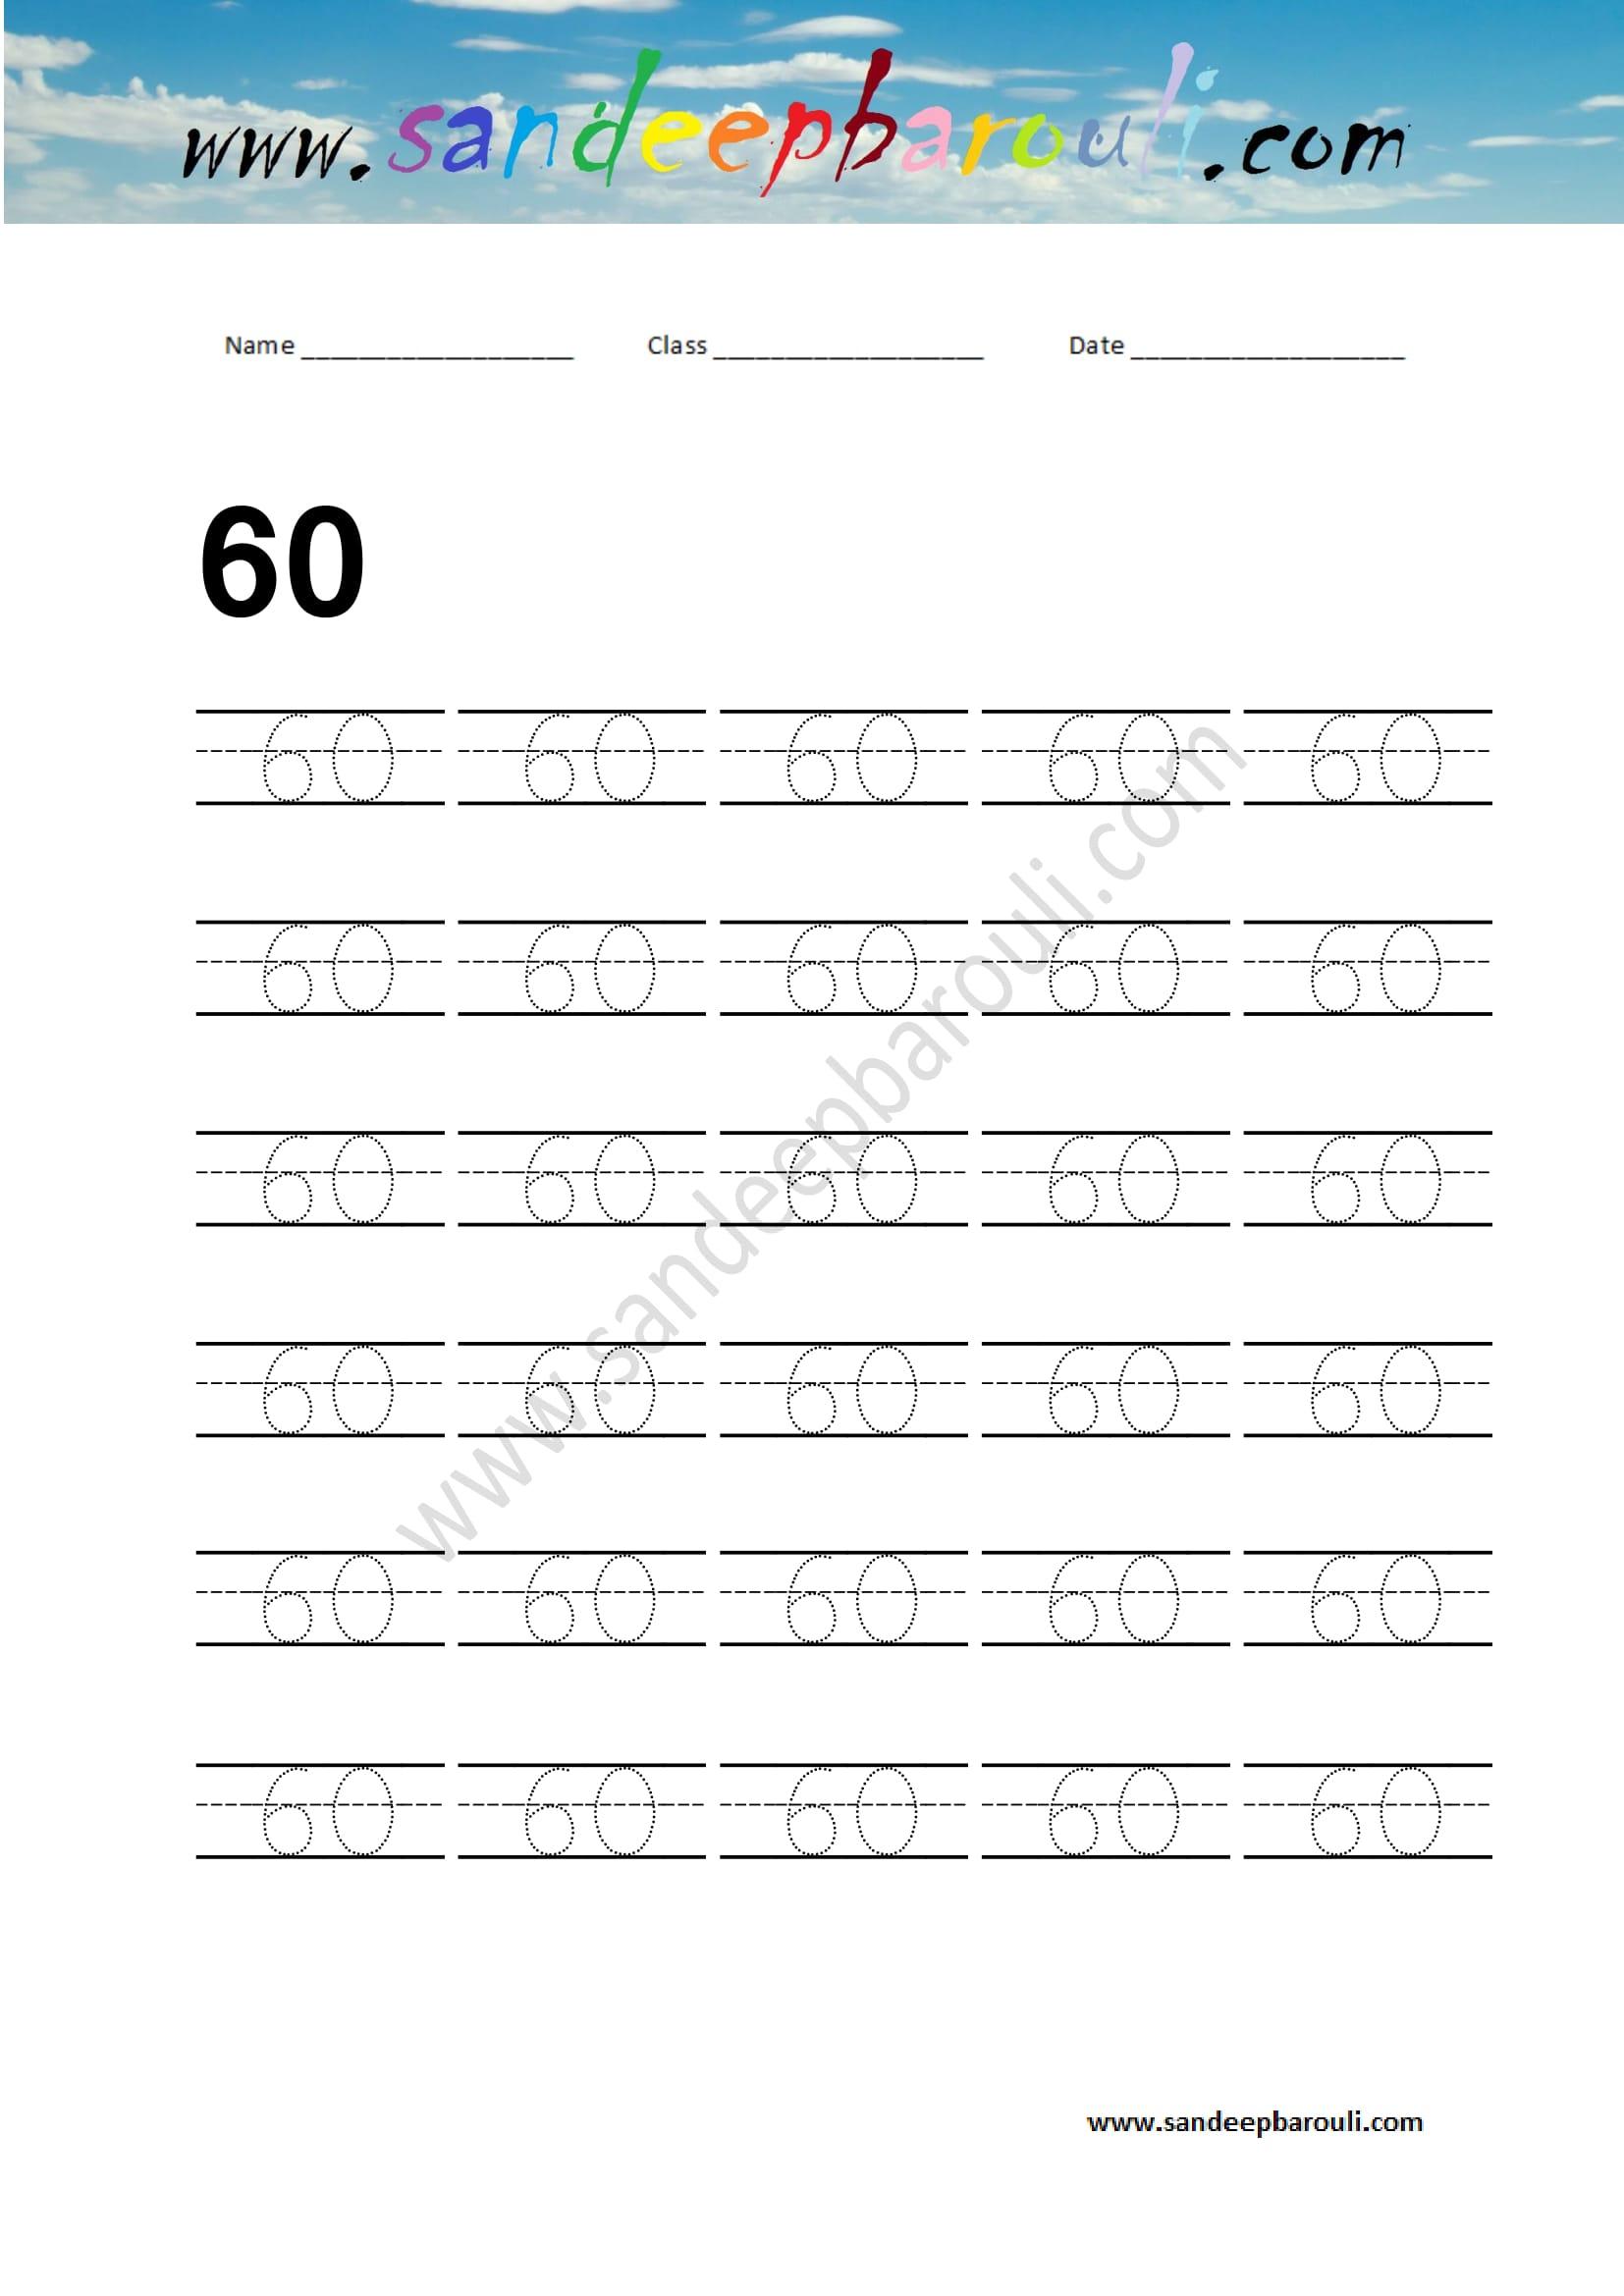 Number Writing Practice Number 60 Sandeepbarouli